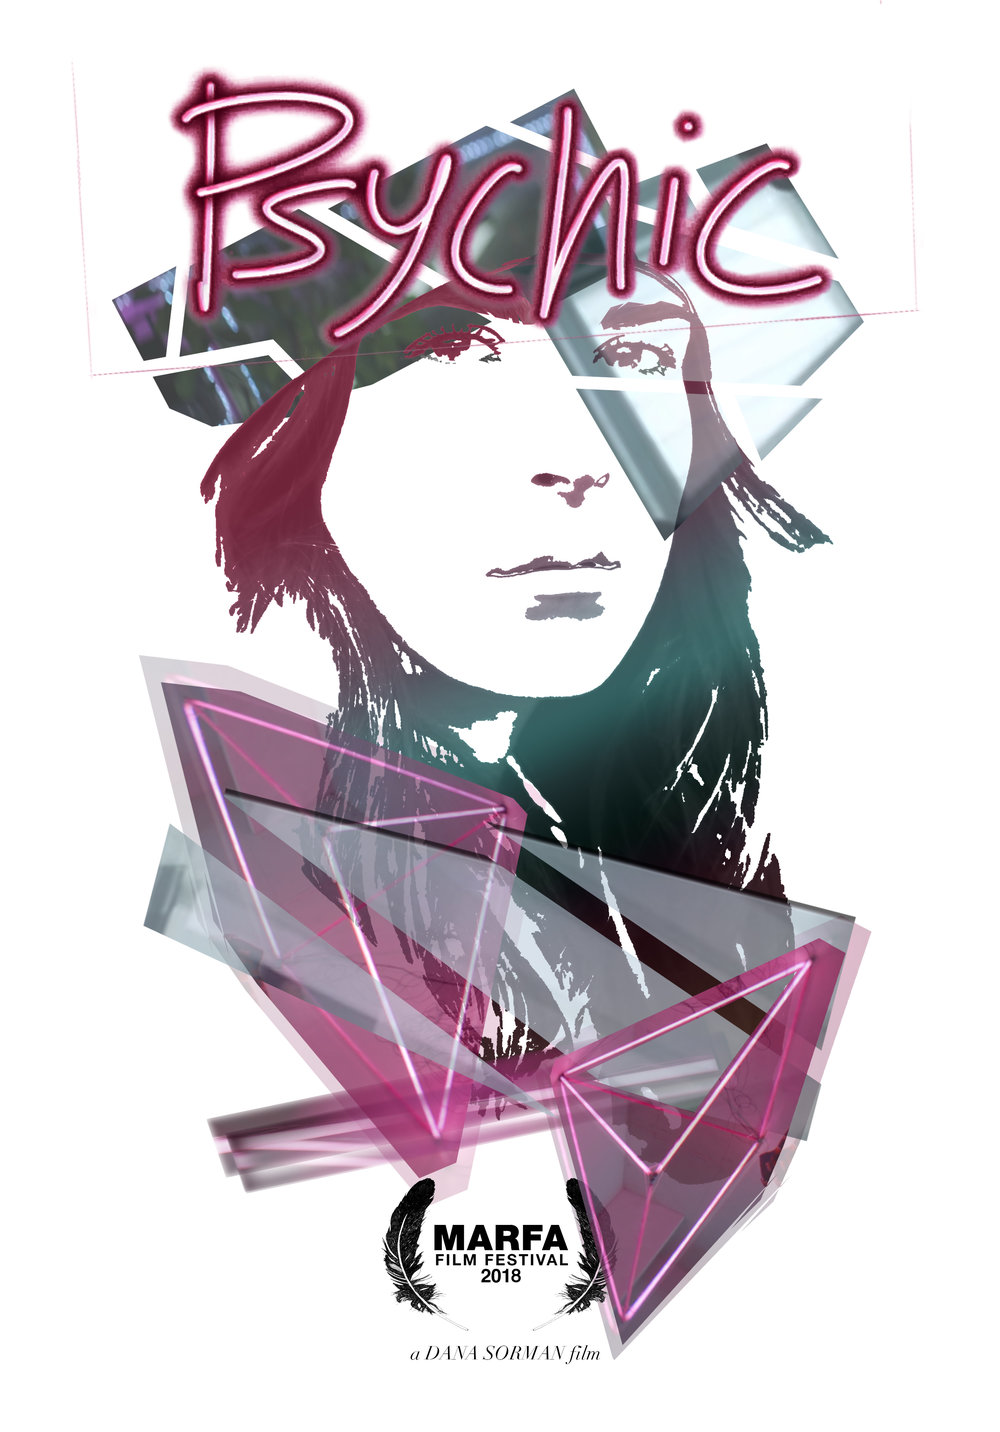 poster design by Jenny Ulmer